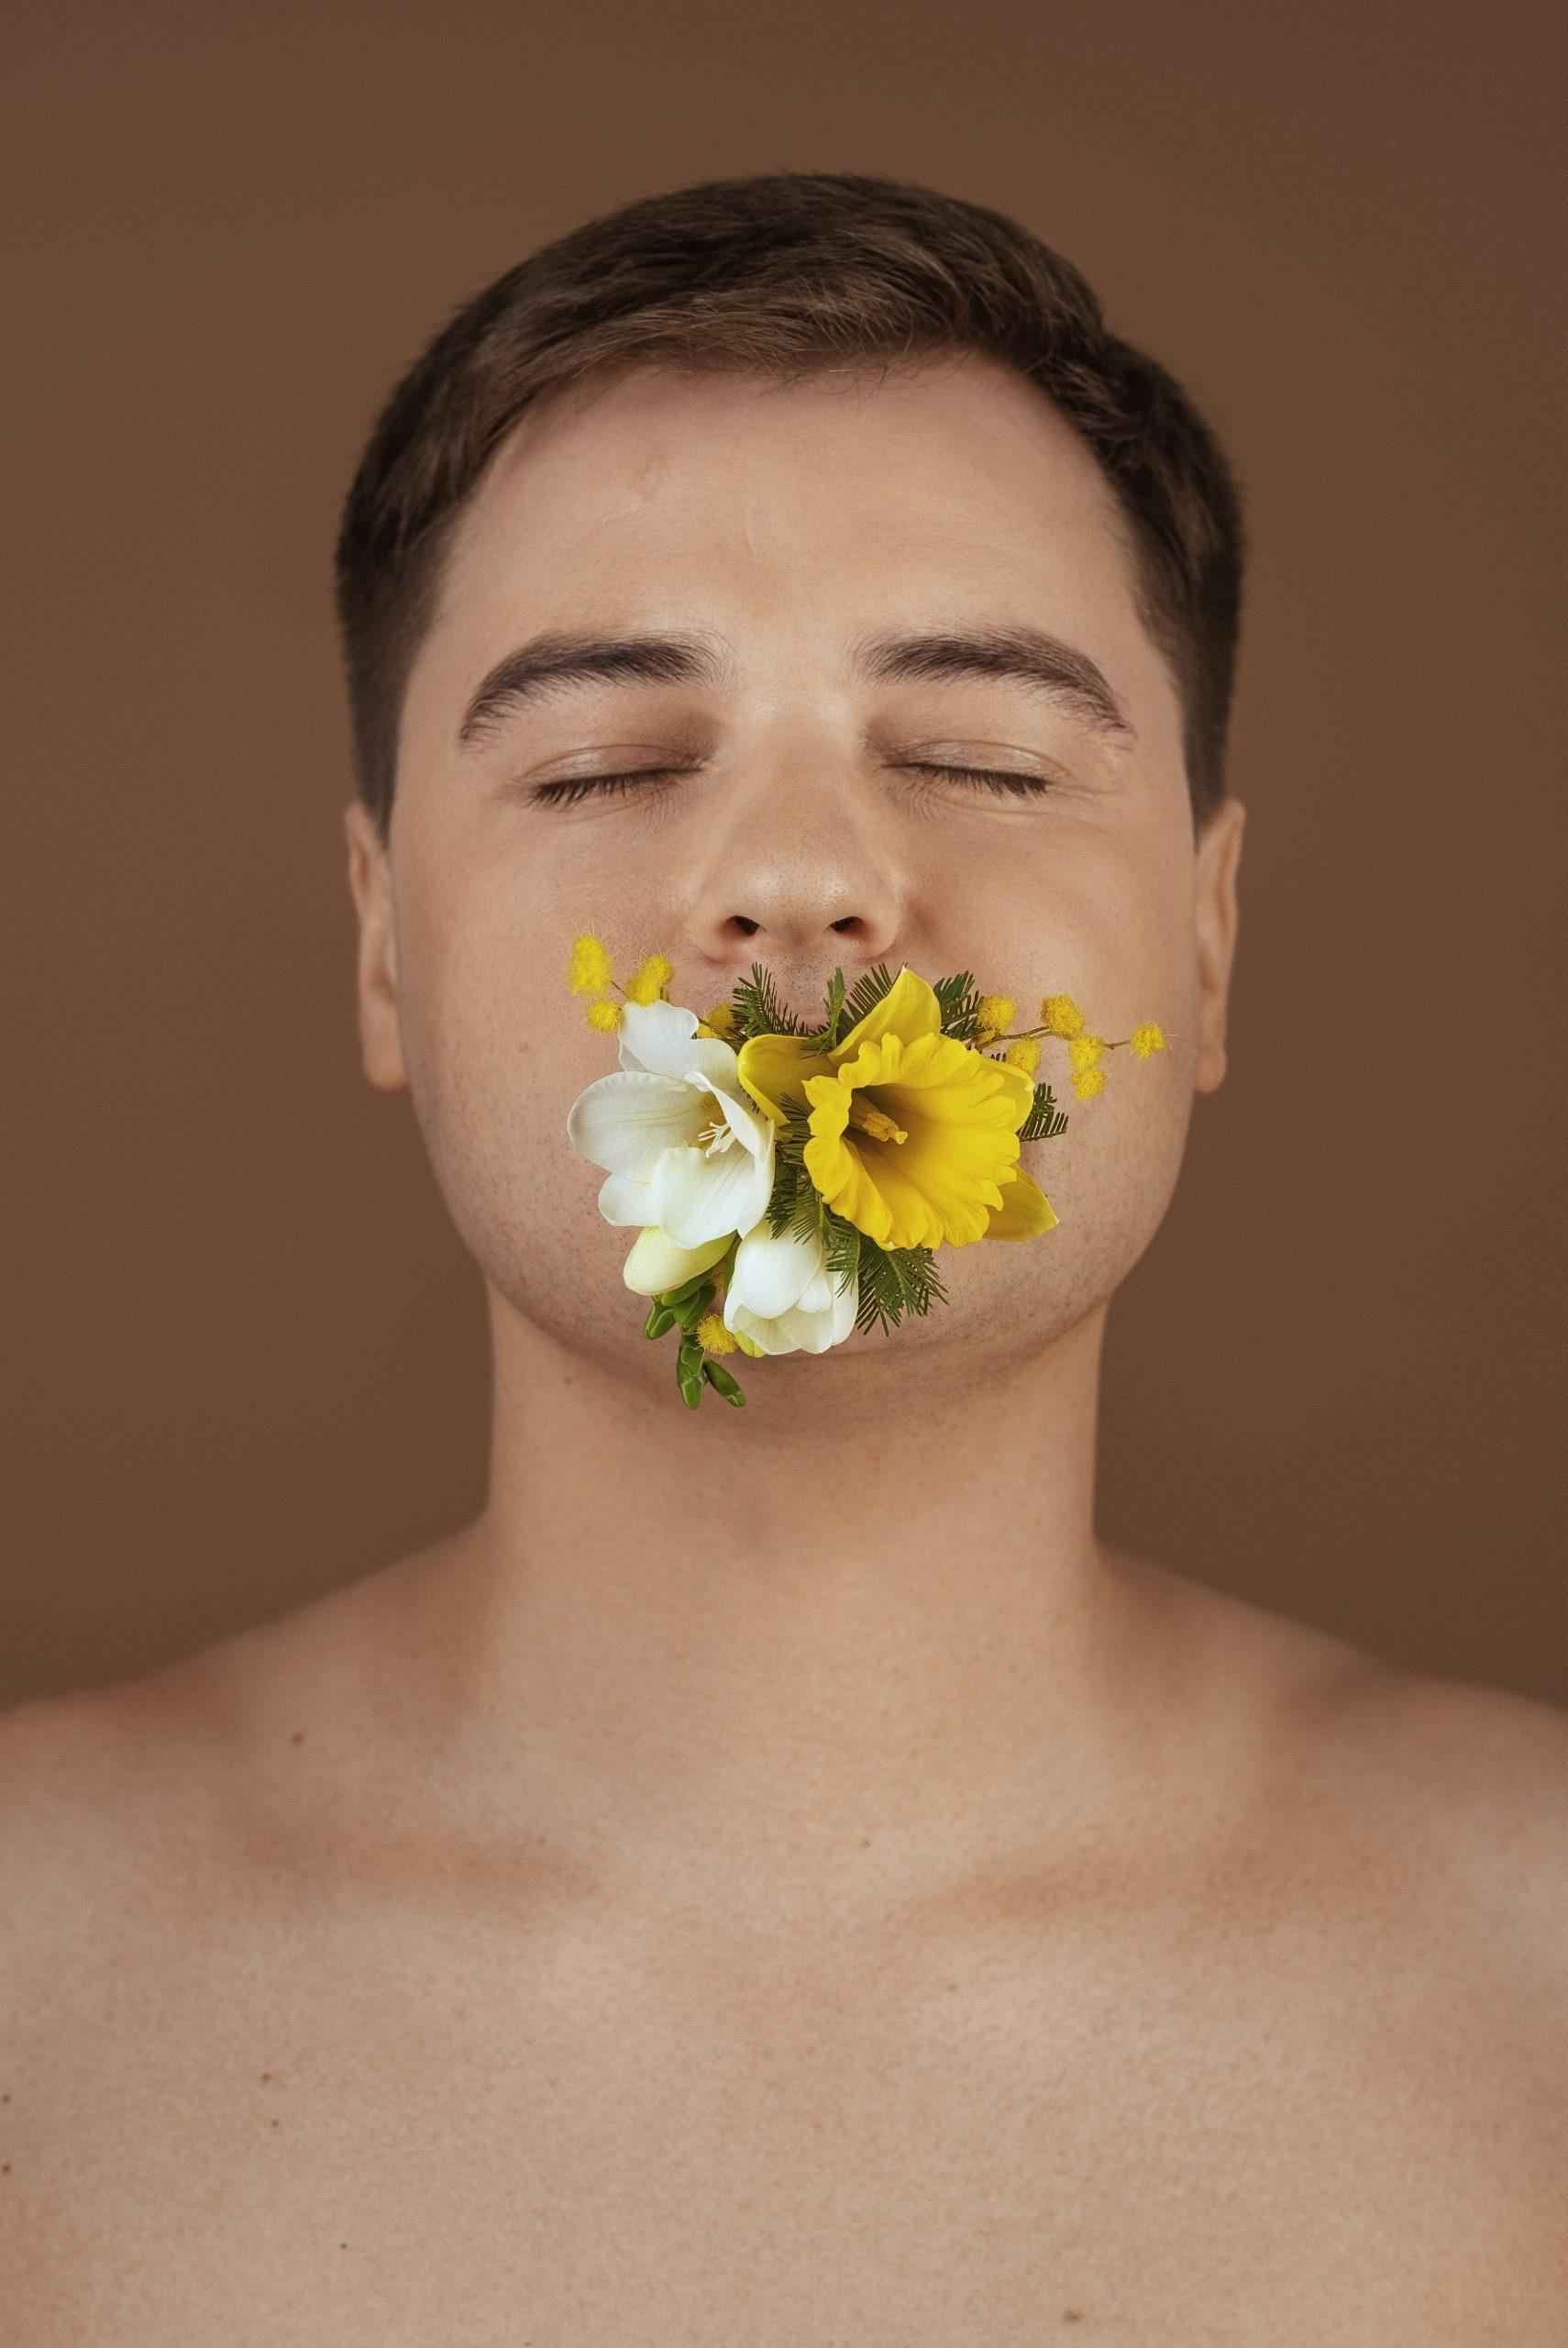 Flourishing masculinity